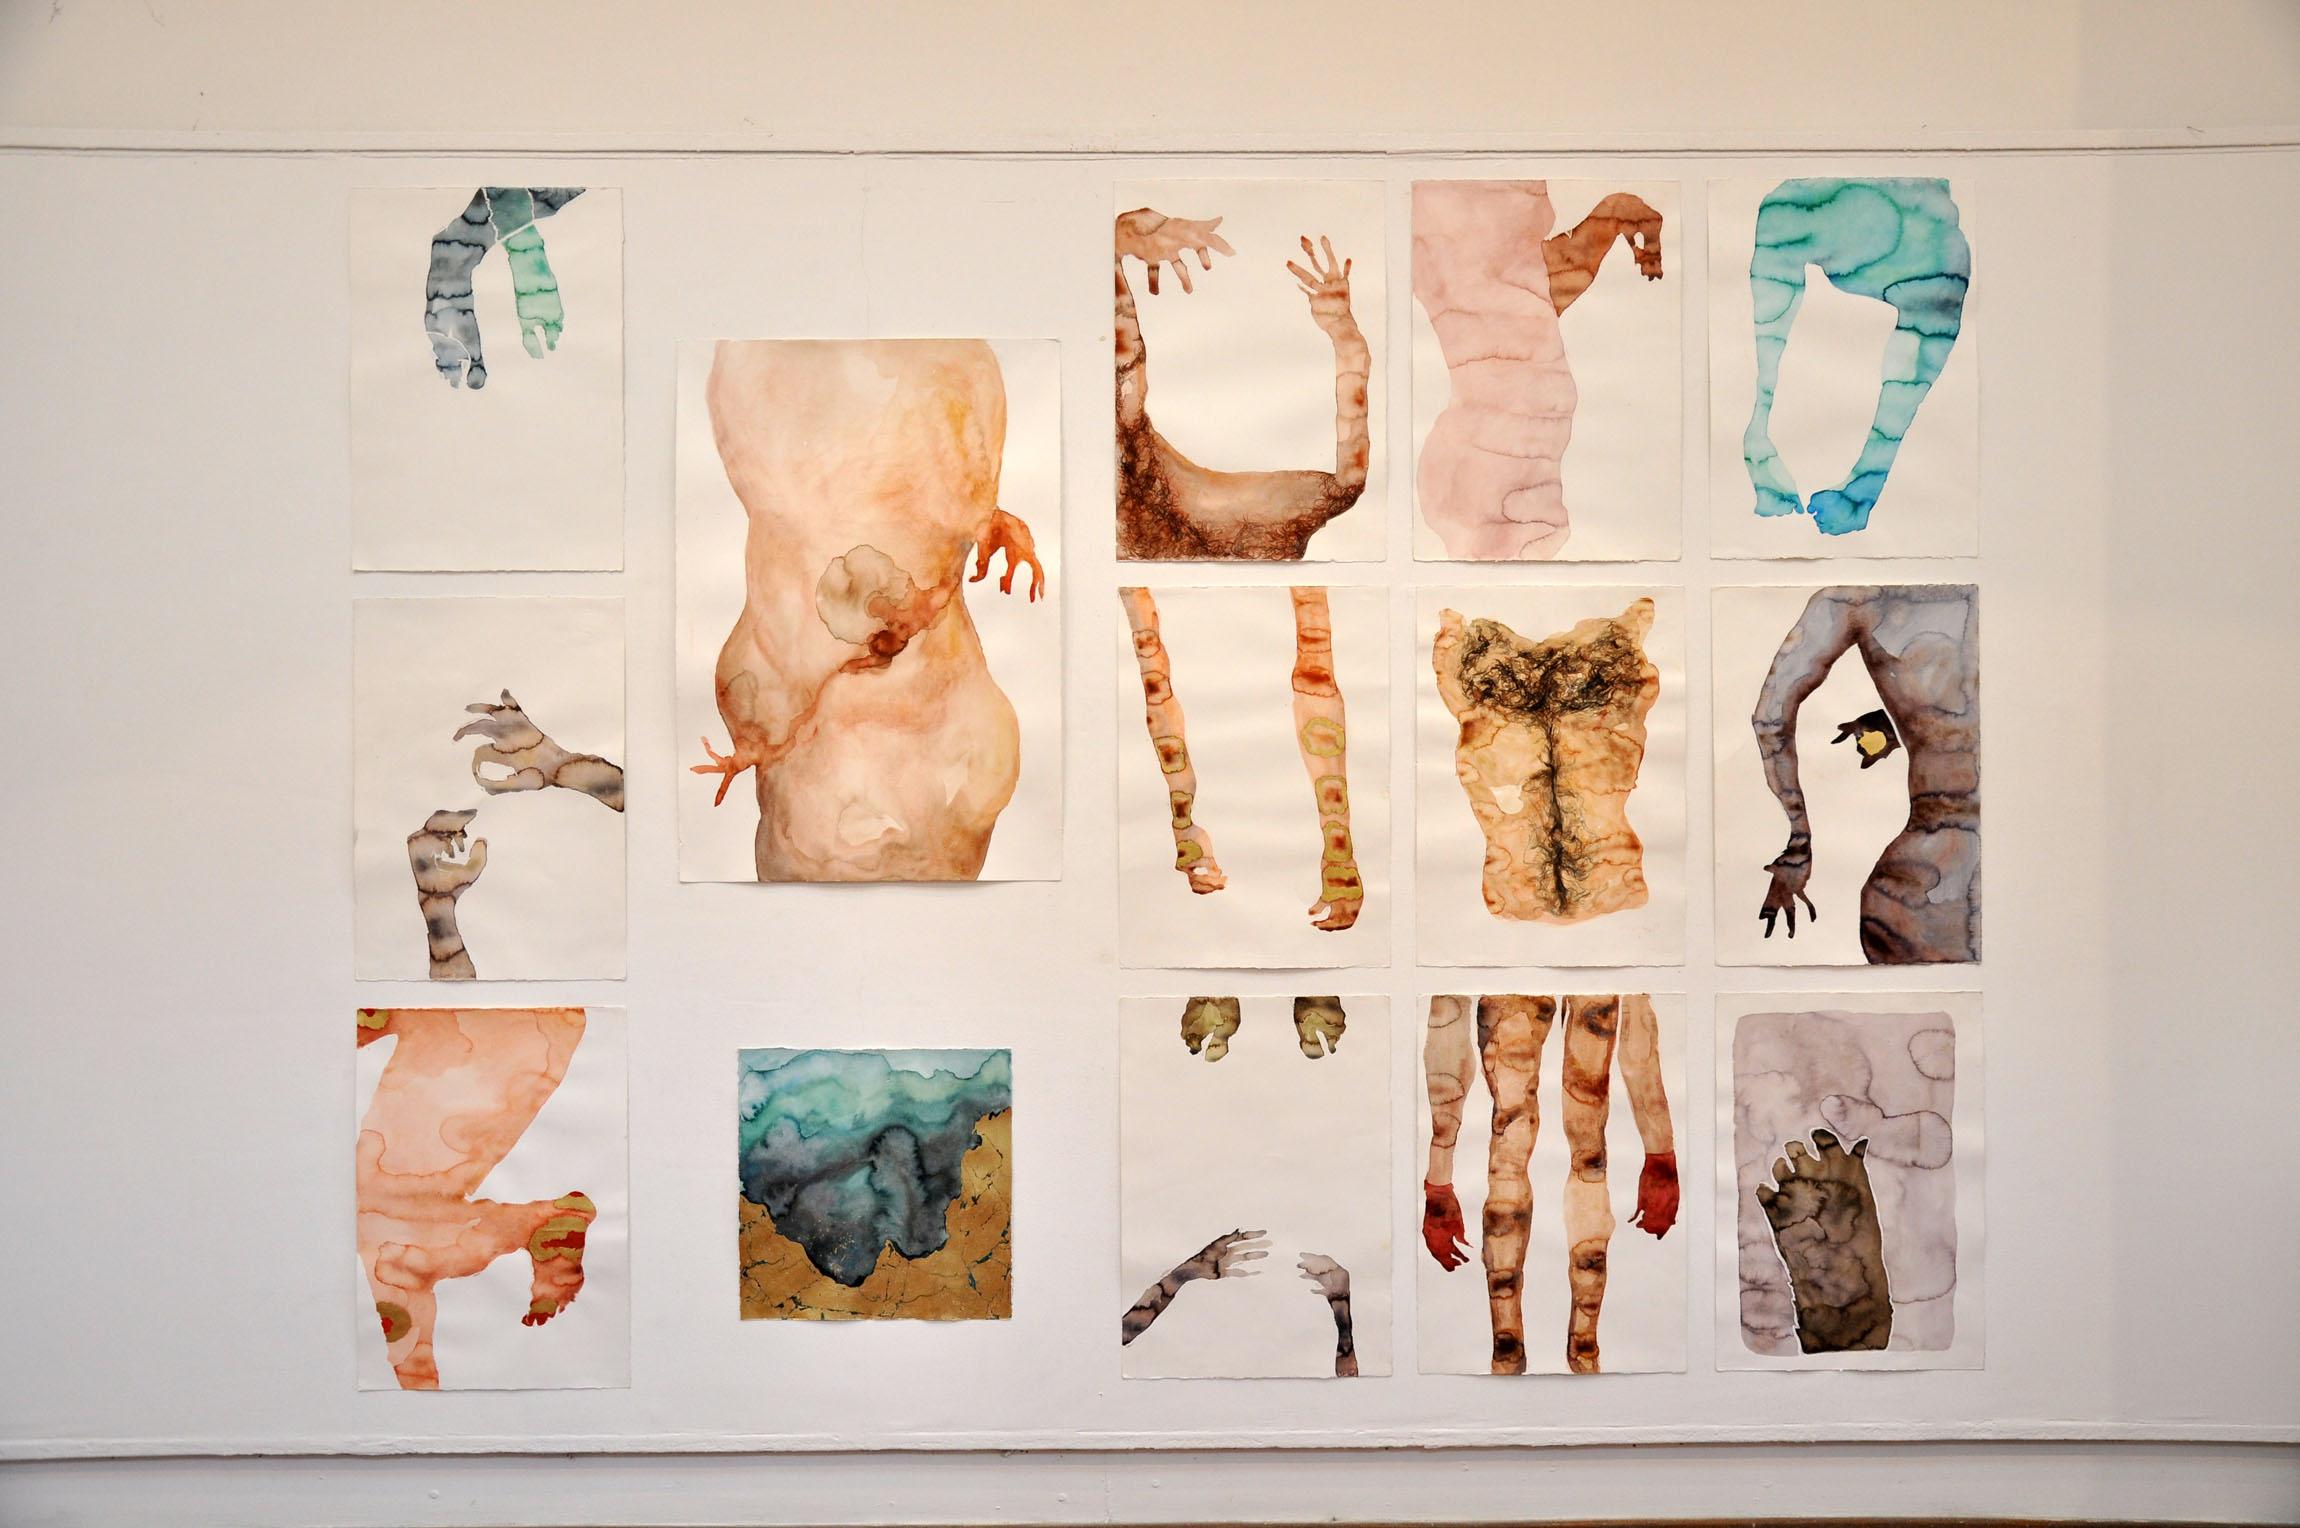 Valedictorian Art Exhibition, Vladan Sibinovic